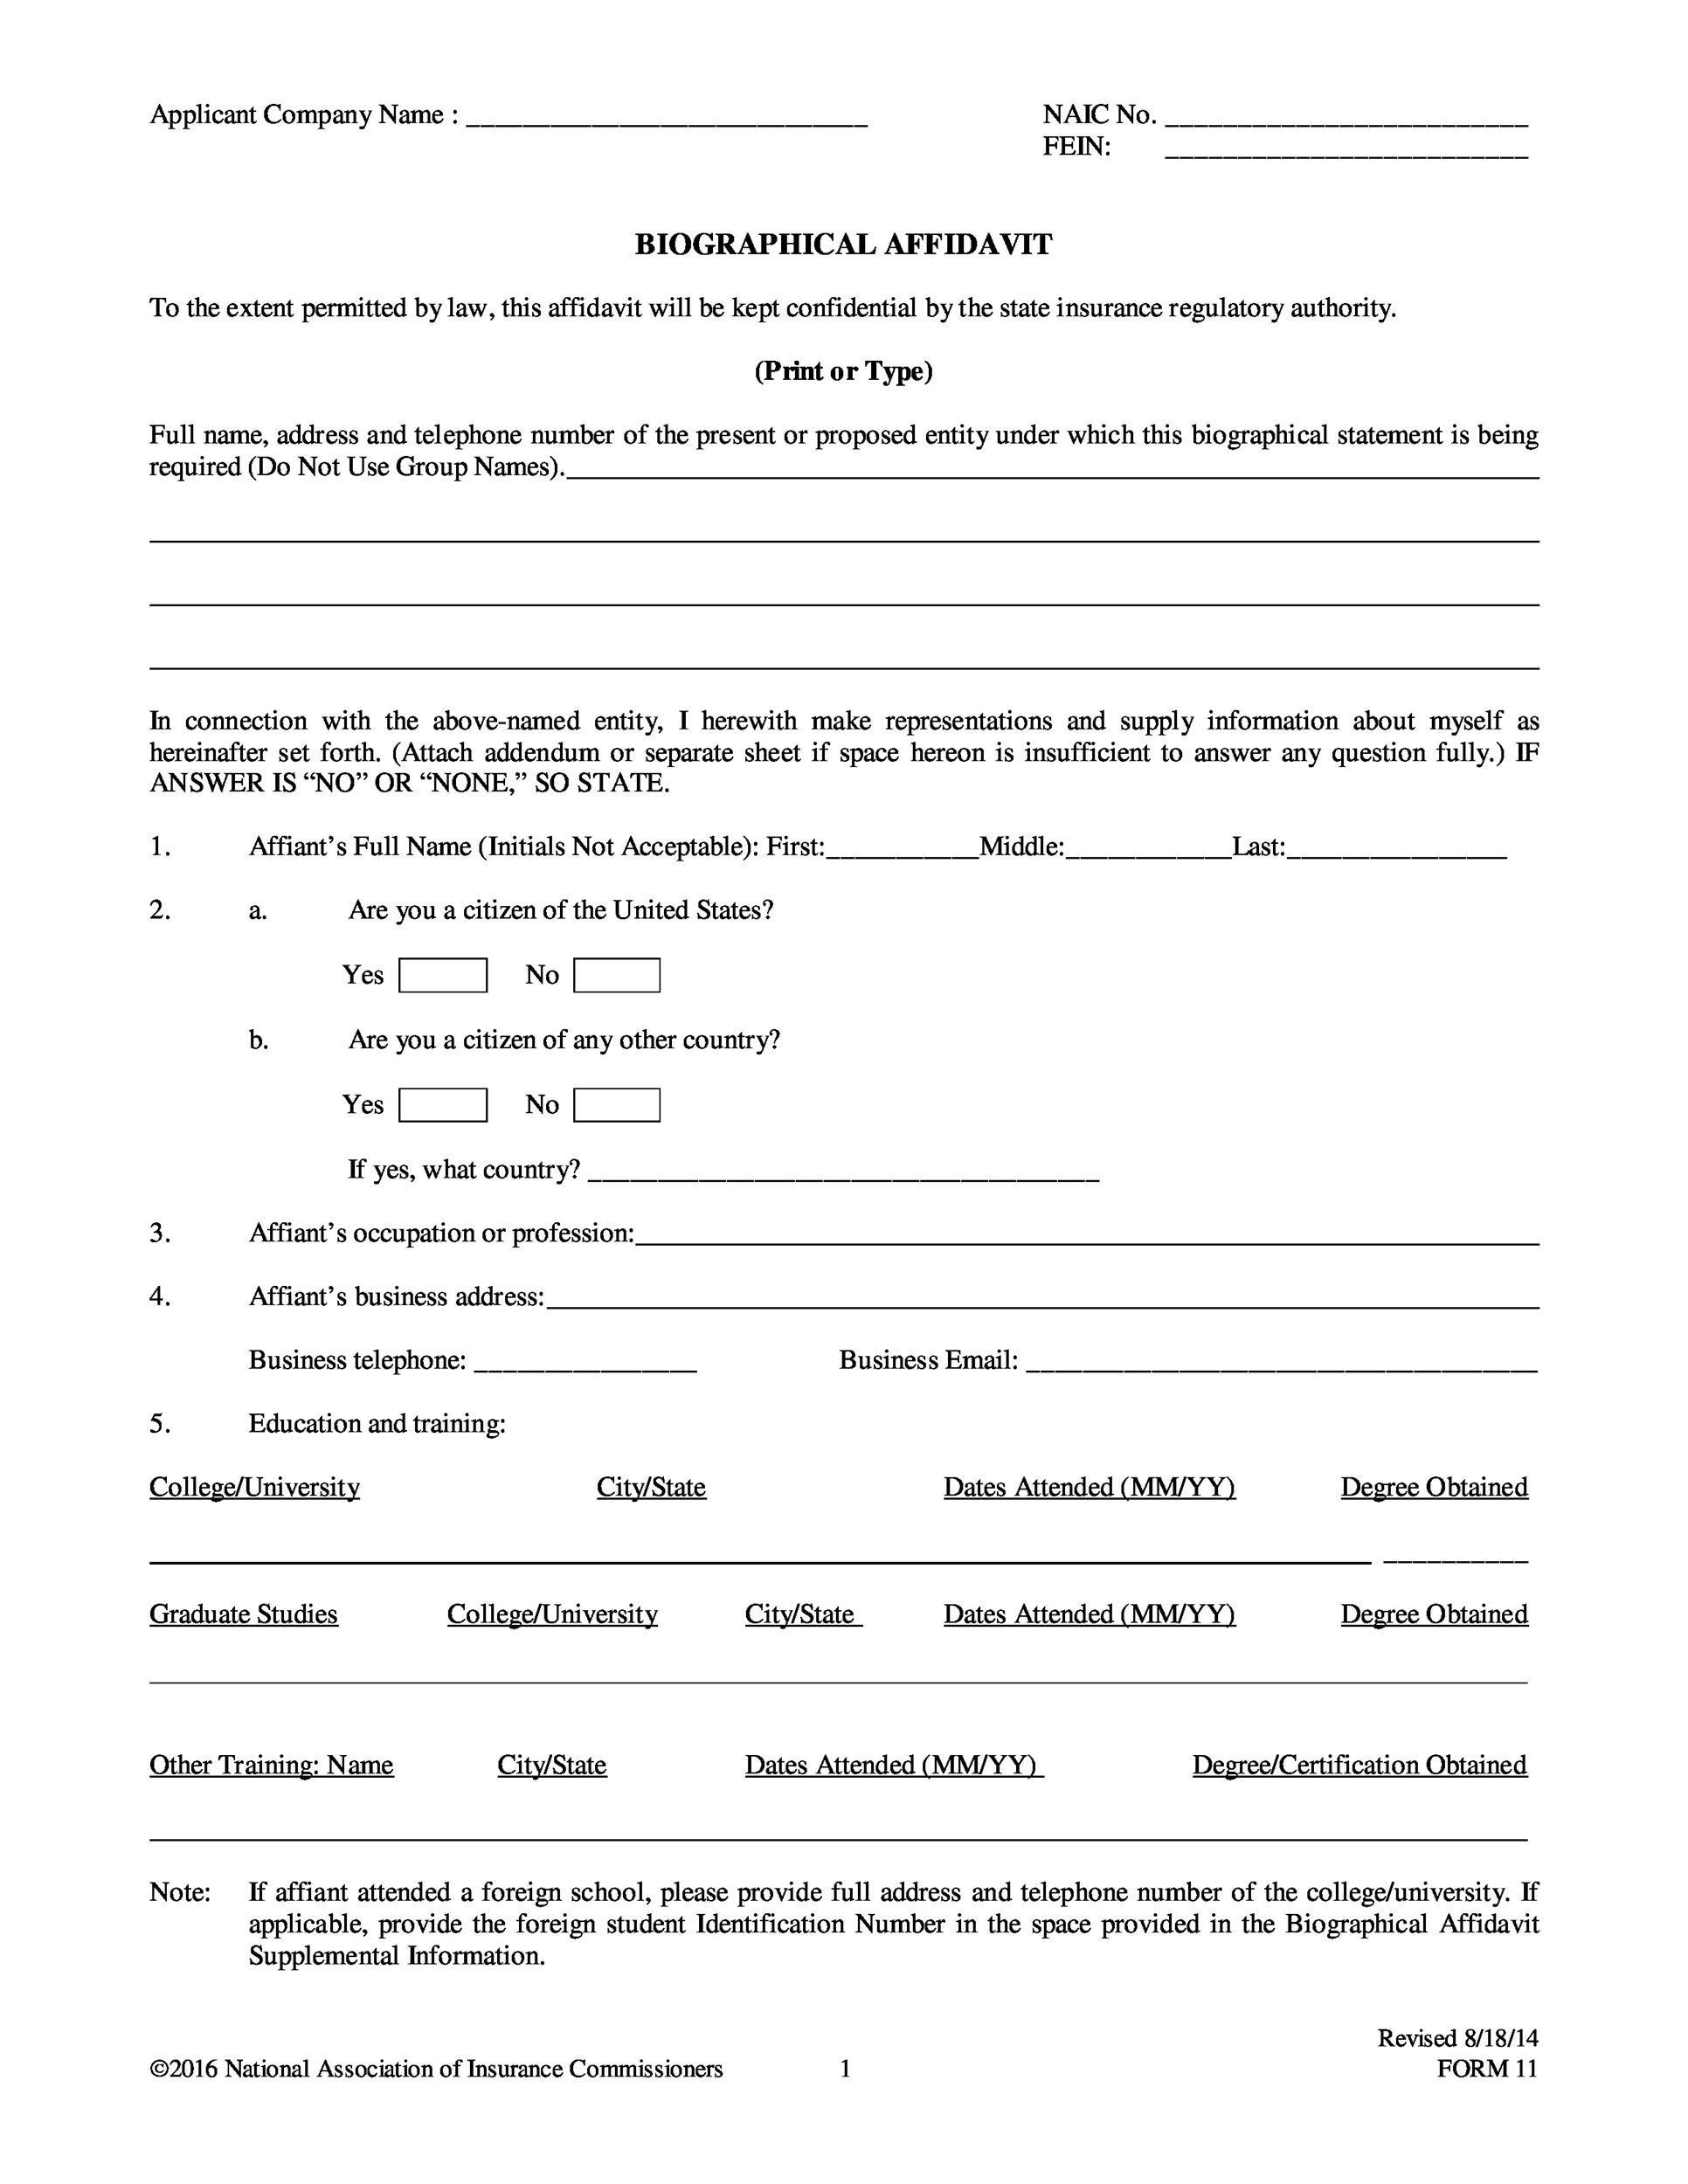 Simple Affidavit Form best cv format in word cv free template – Standard Affidavit Form